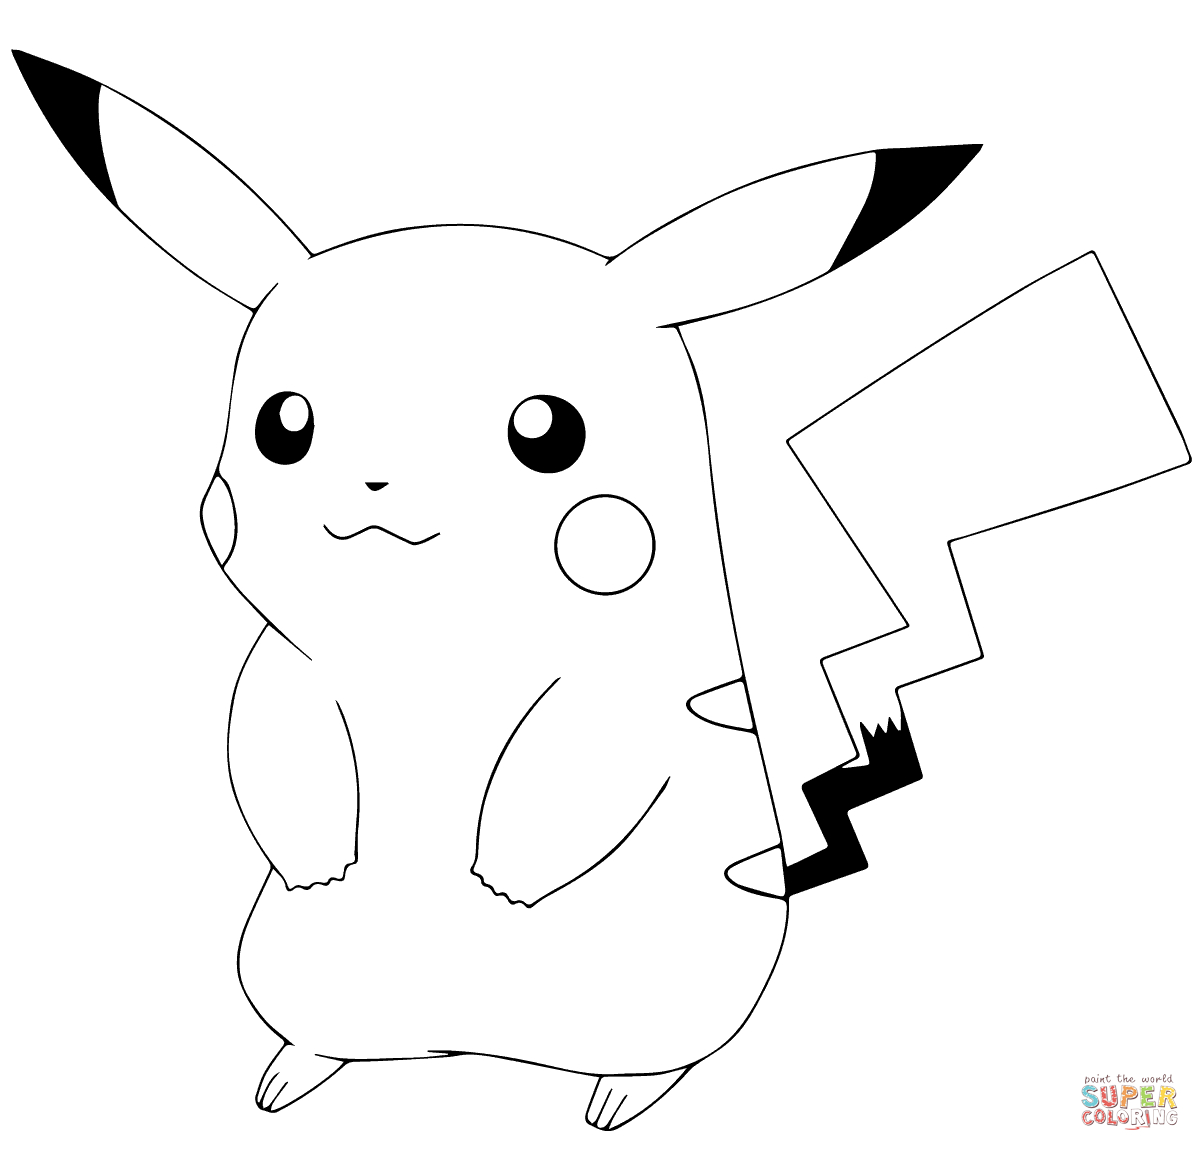 Pokémon Go Pikachu Coloring Page   Free Printable Coloring Pages - Free Printable Pokemon Coloring Pages